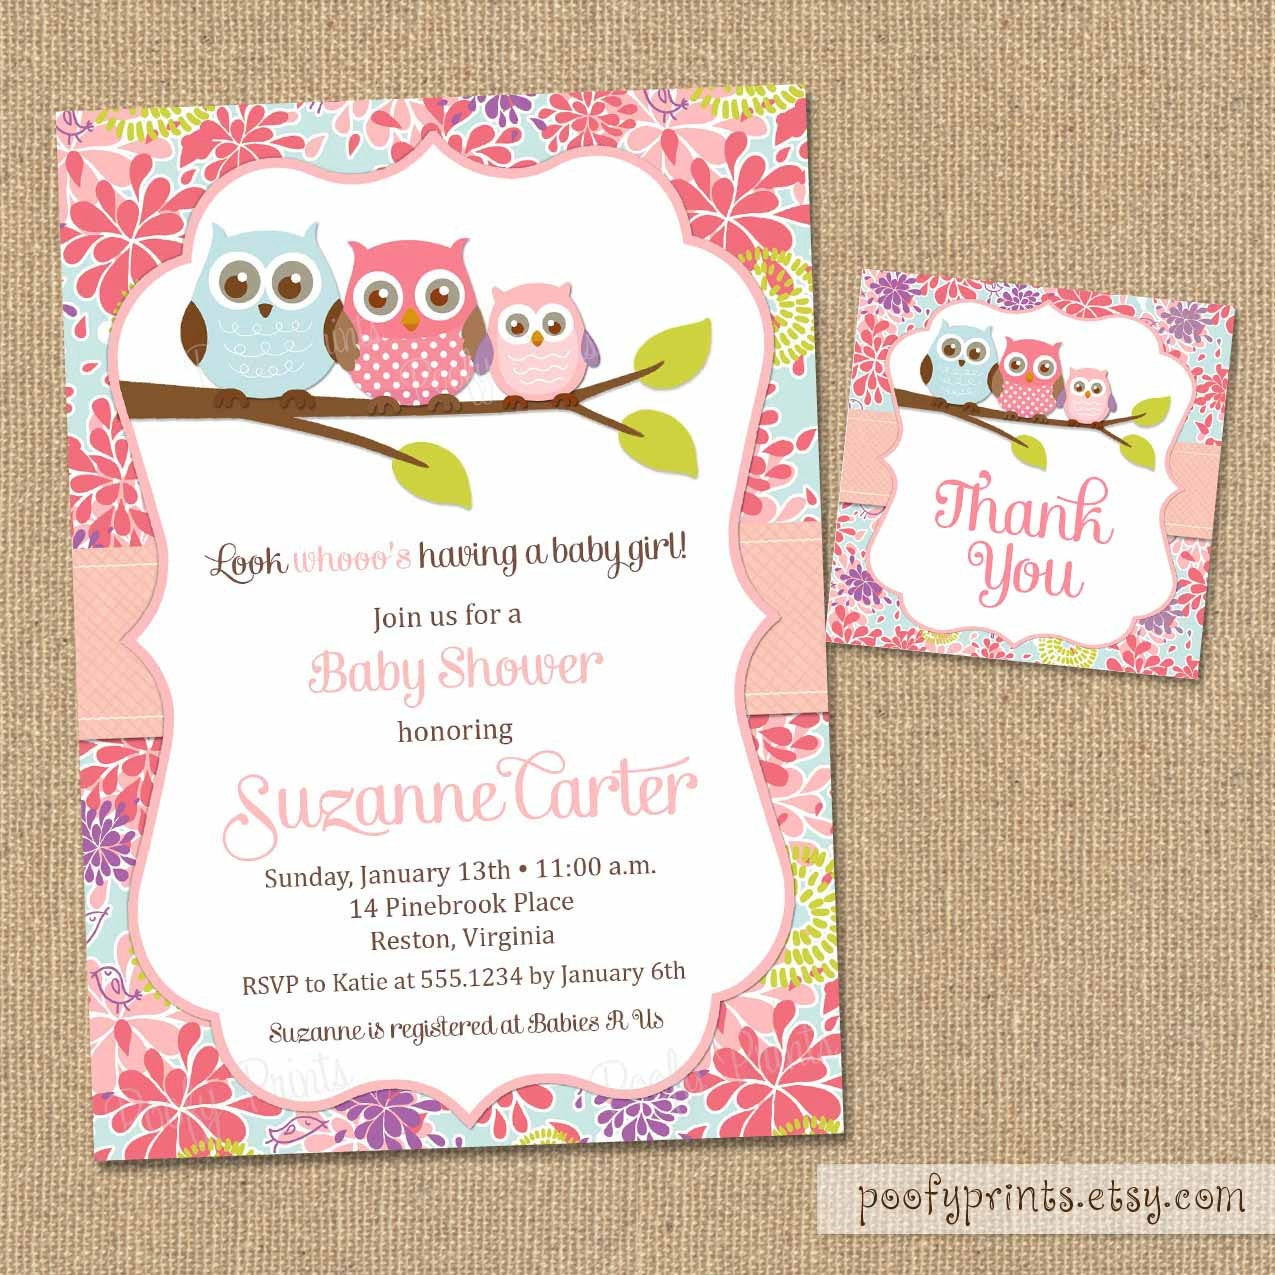 DIY Baby Shower Invitations Free  Owl Baby Shower Invitations DIY Printable Baby by PoofyPrints